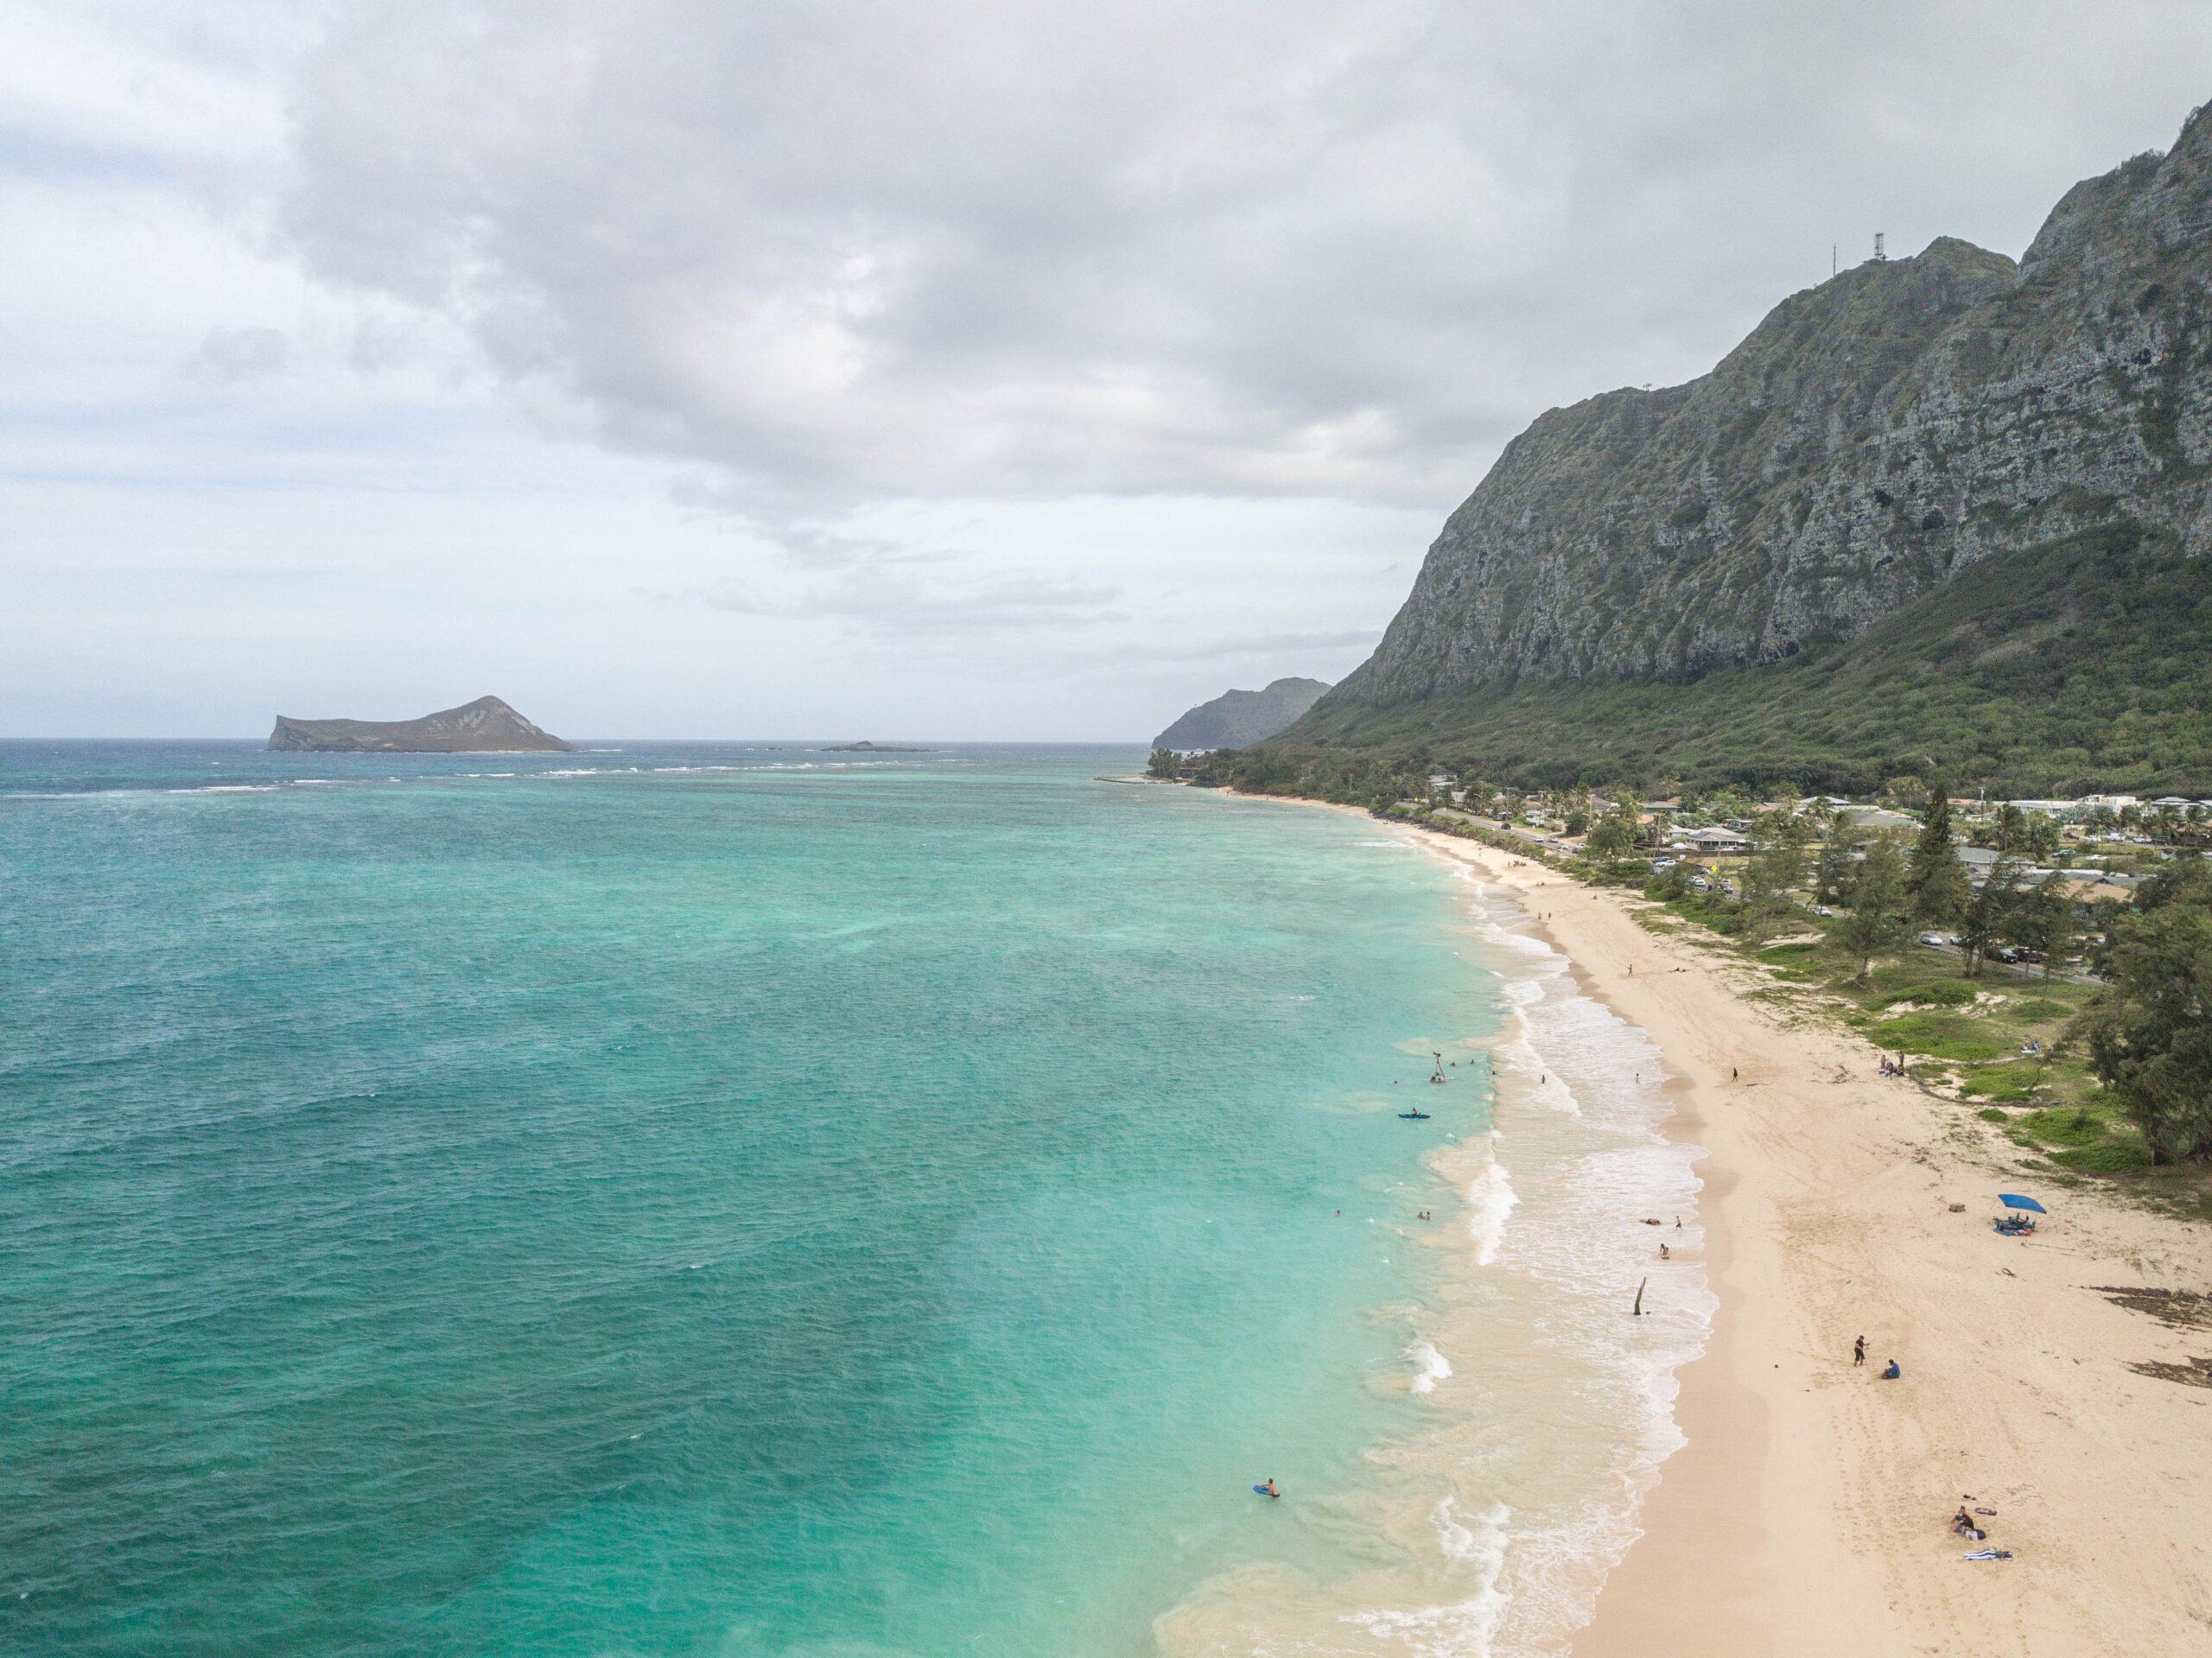 Waimanalo Beach Coastline - Turquoise ocean with white sand beach and mountain ridge coast